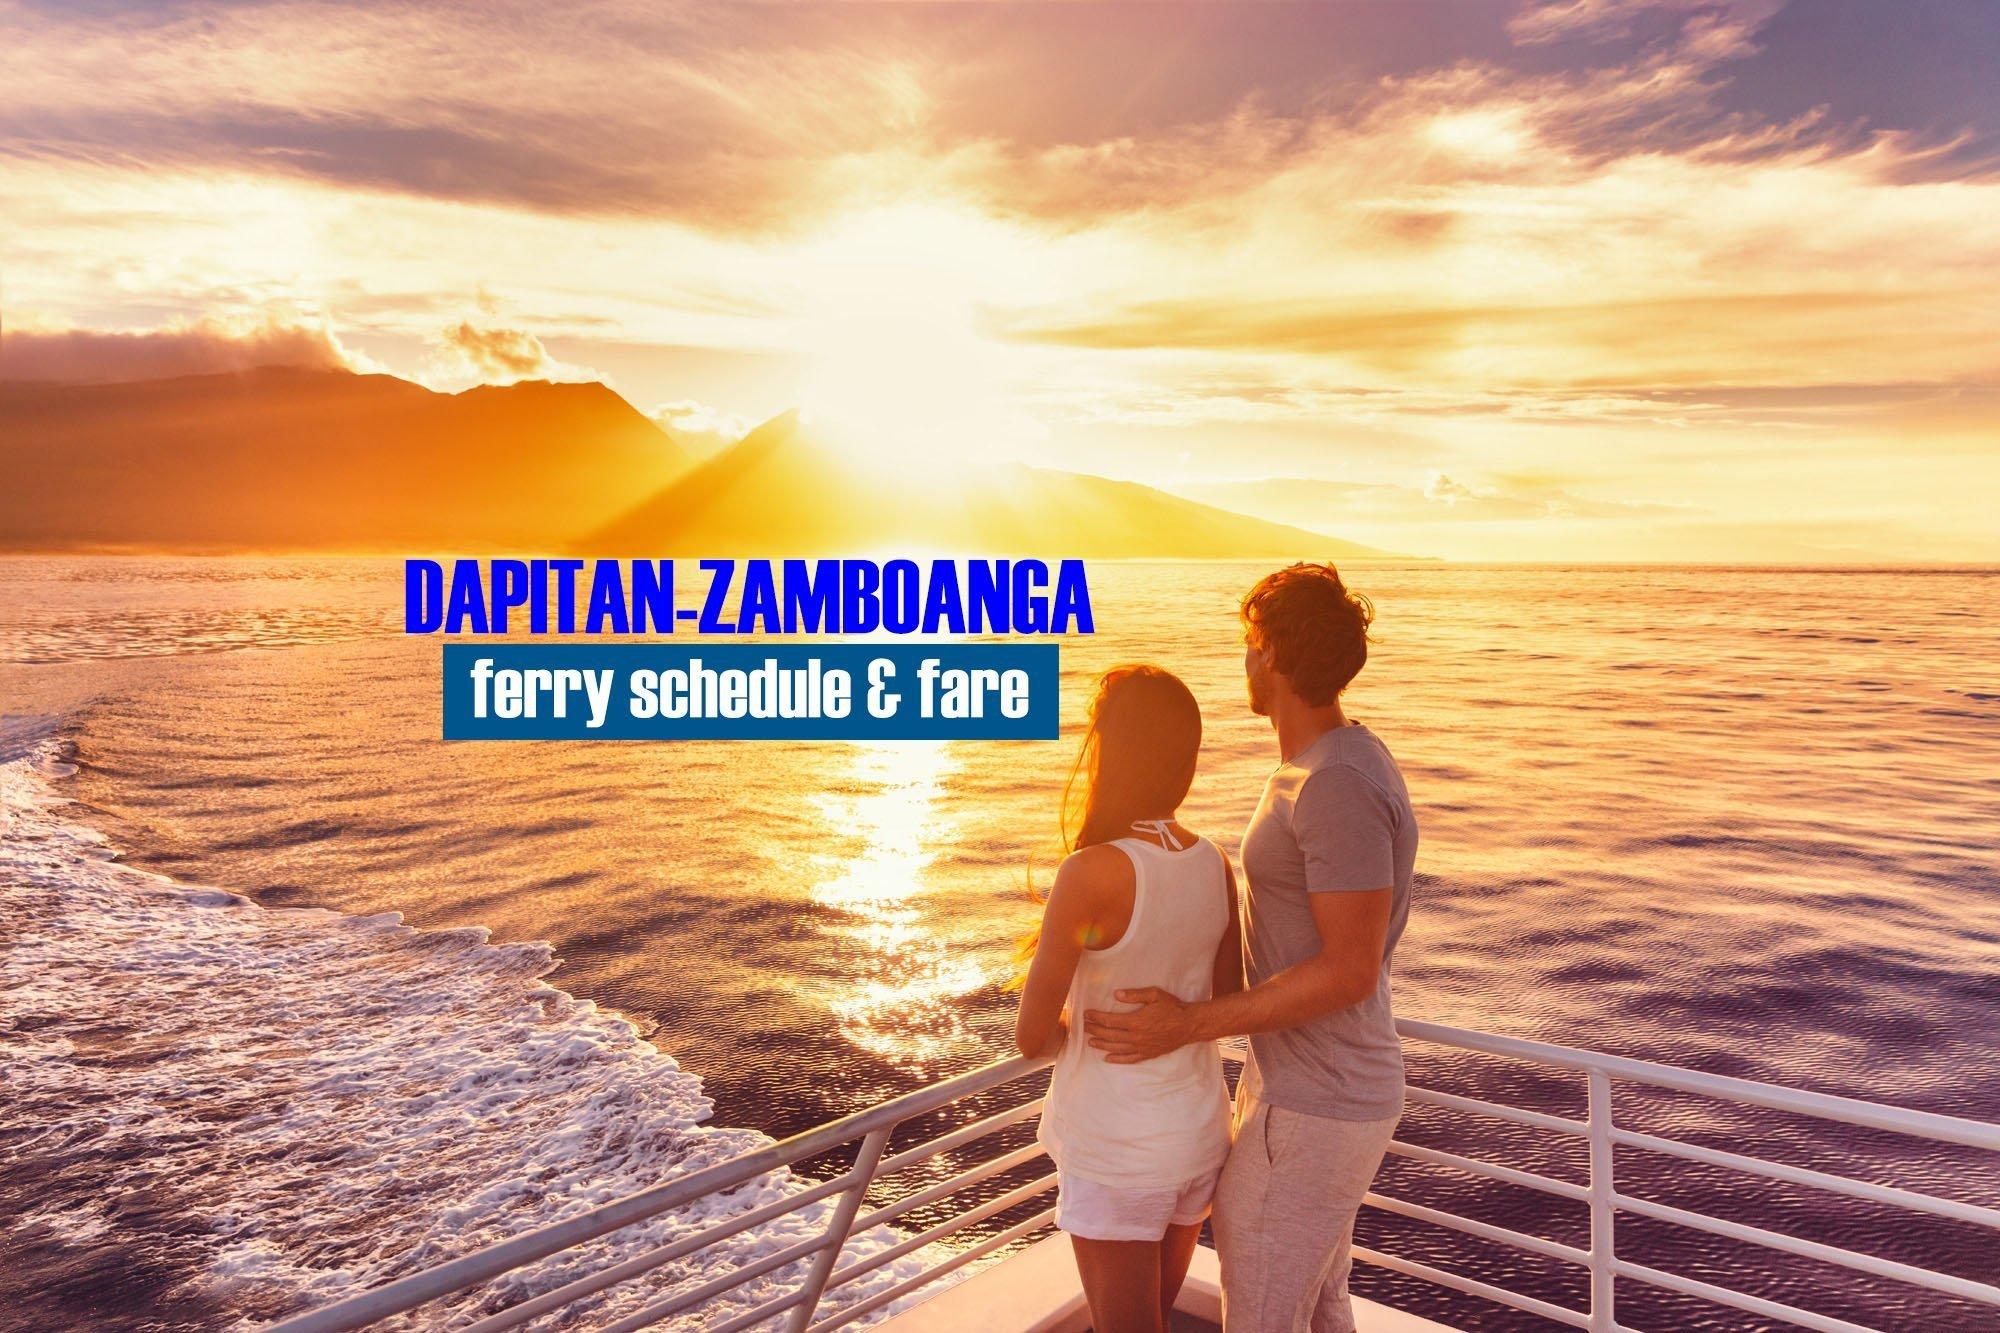 Dapitan to Zamboanga: 2019 Boat Schedule and Fare